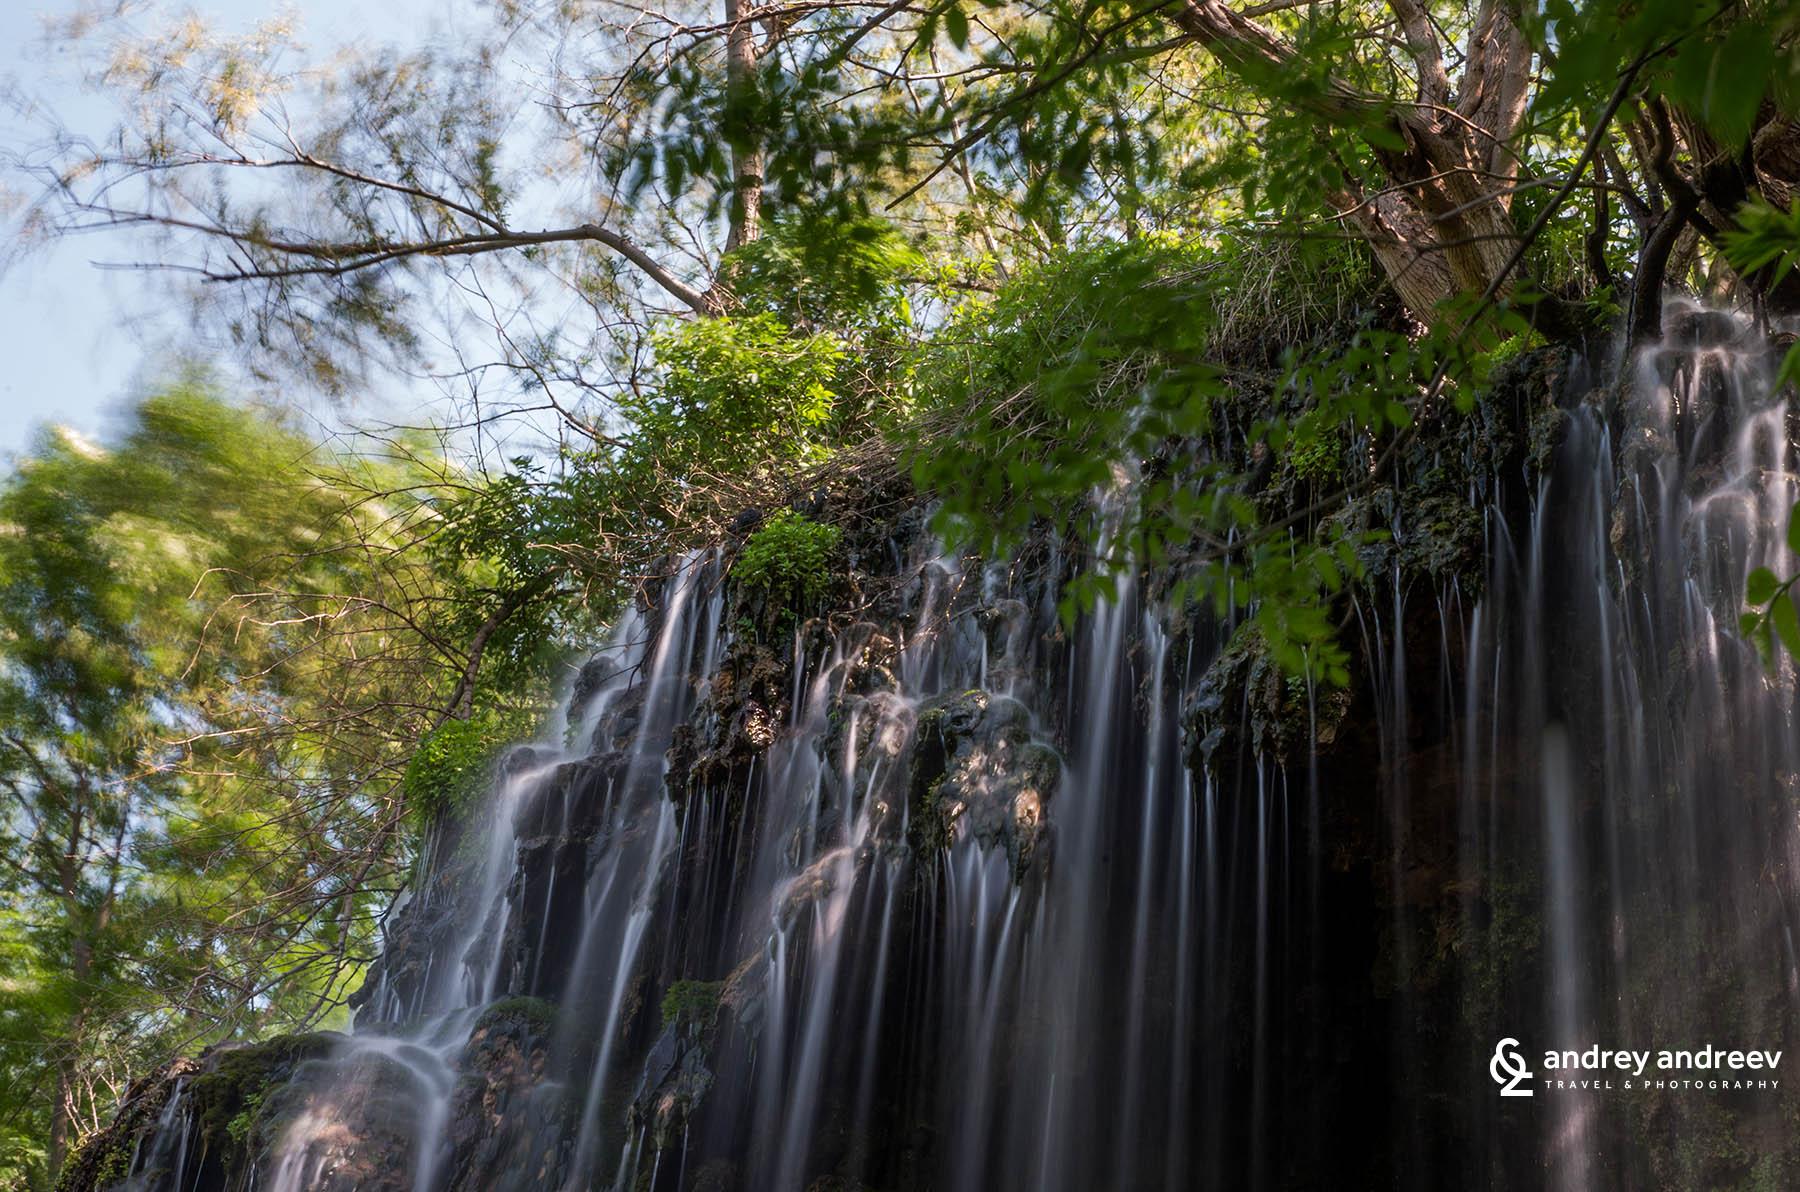 Водопад Зелената скала / The green rock waterfall